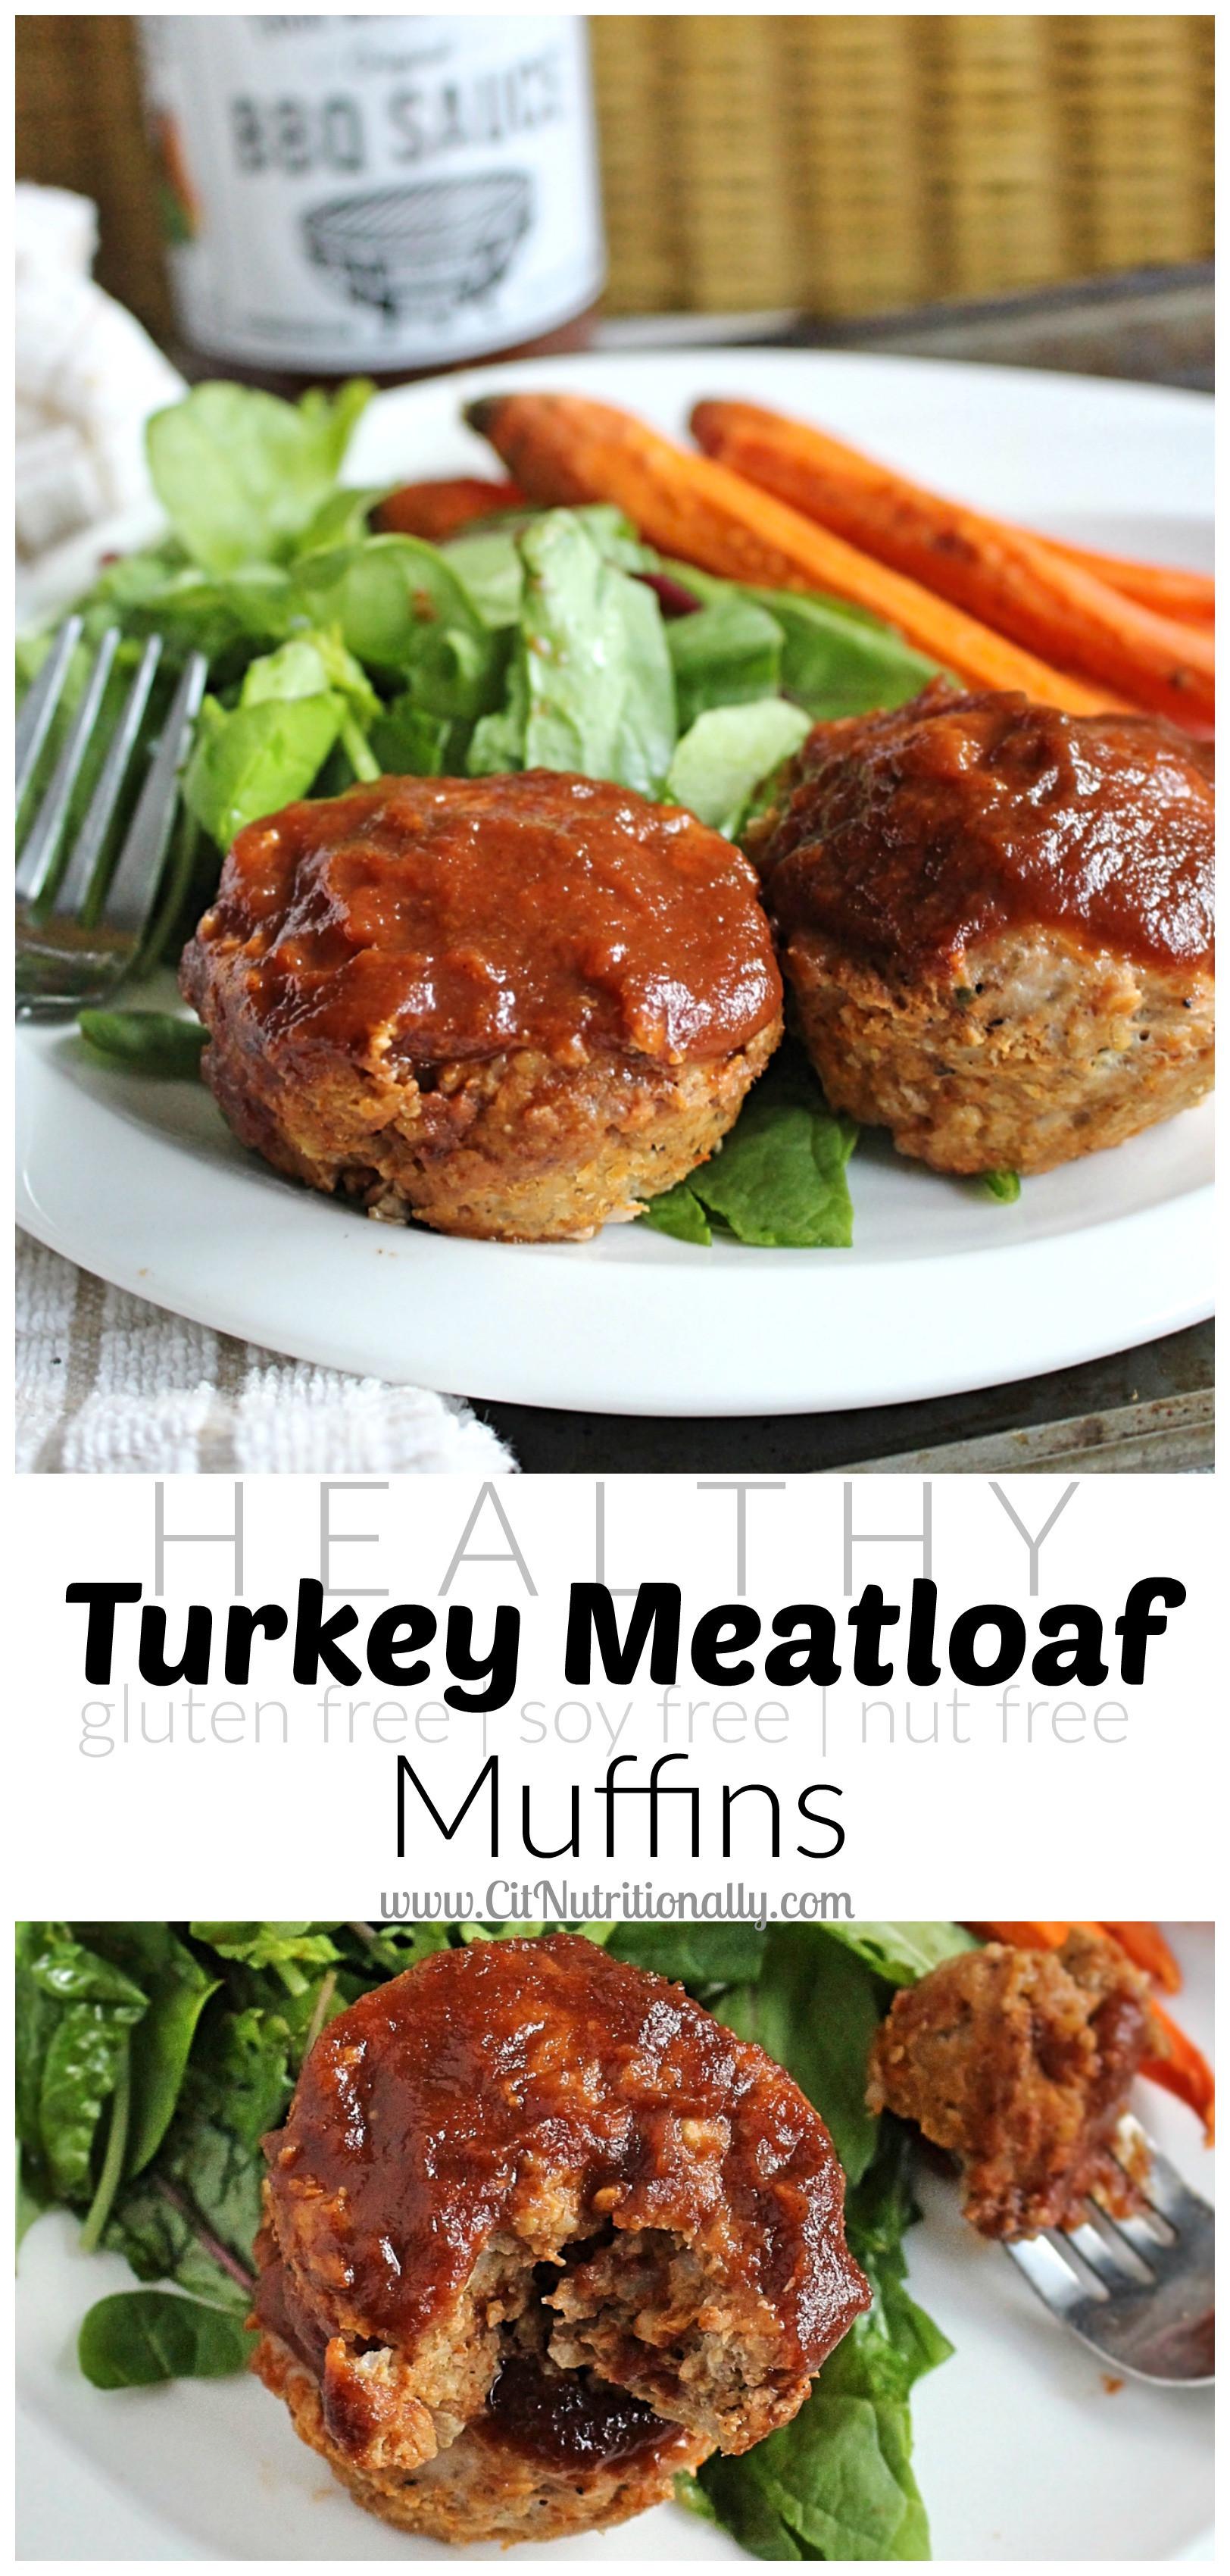 Turkey Meatloaf Healthy  healthy turkey meatloaf